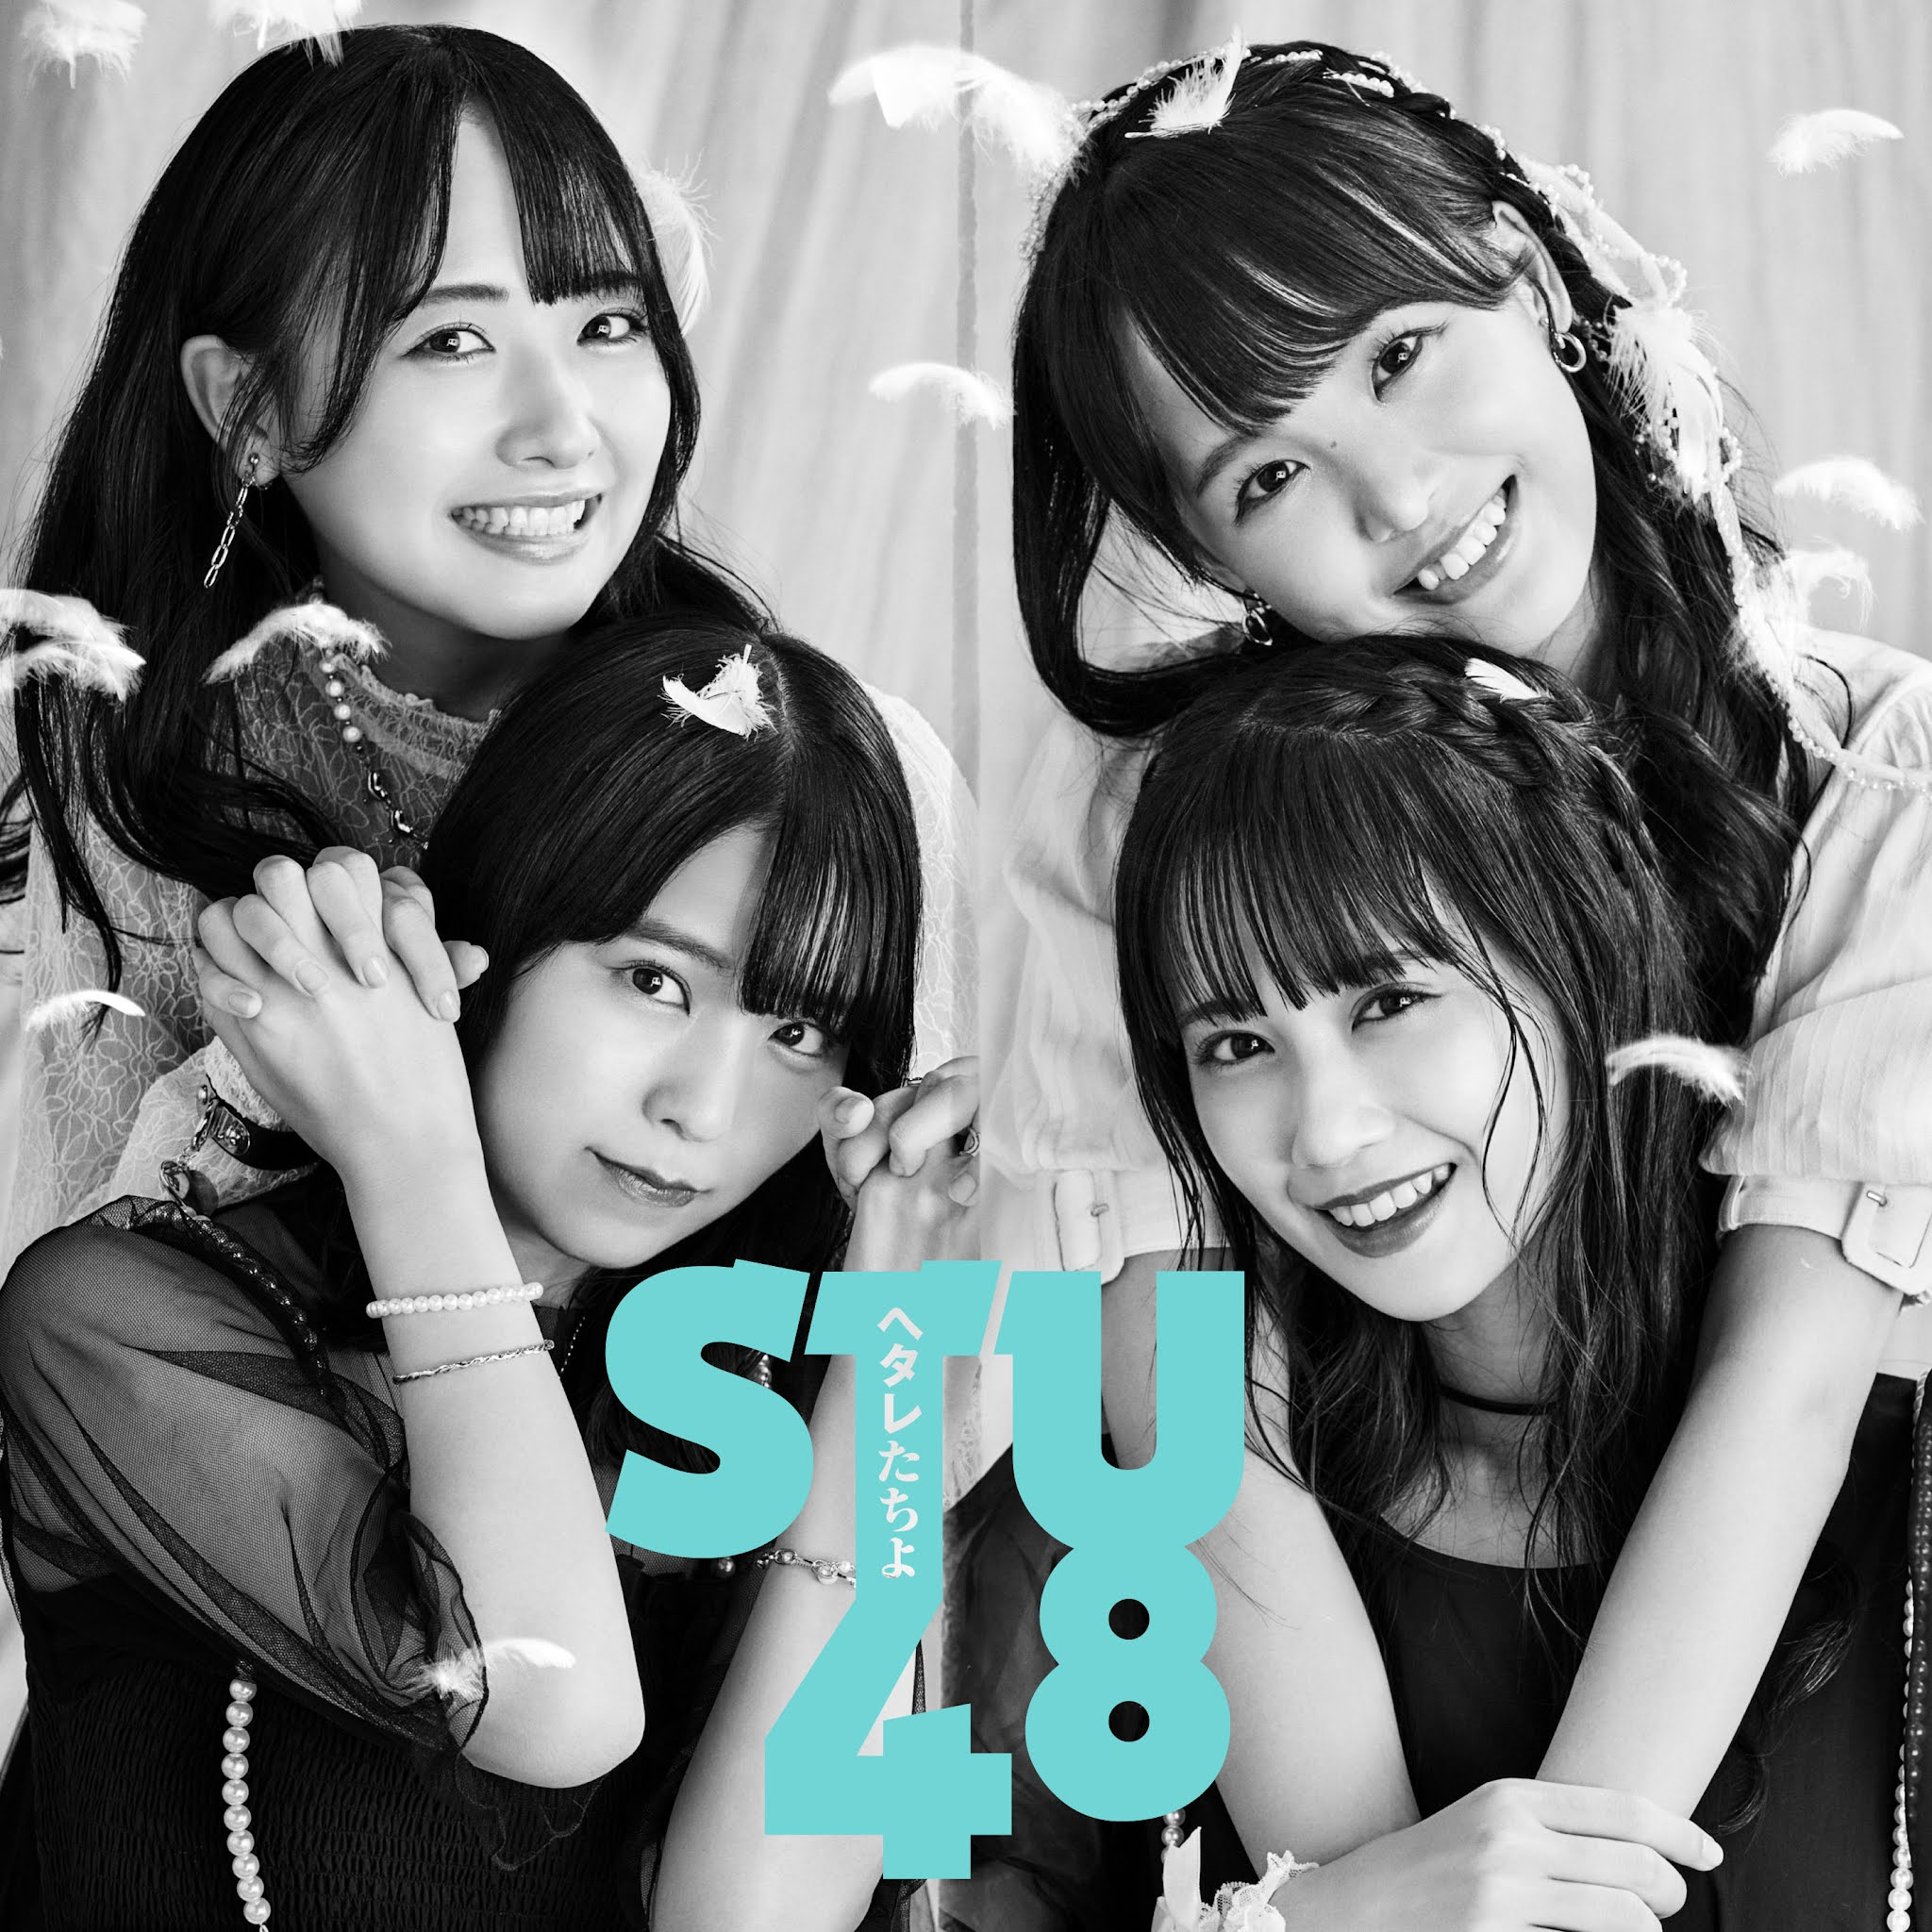 STU48 - ヘタレたちよ